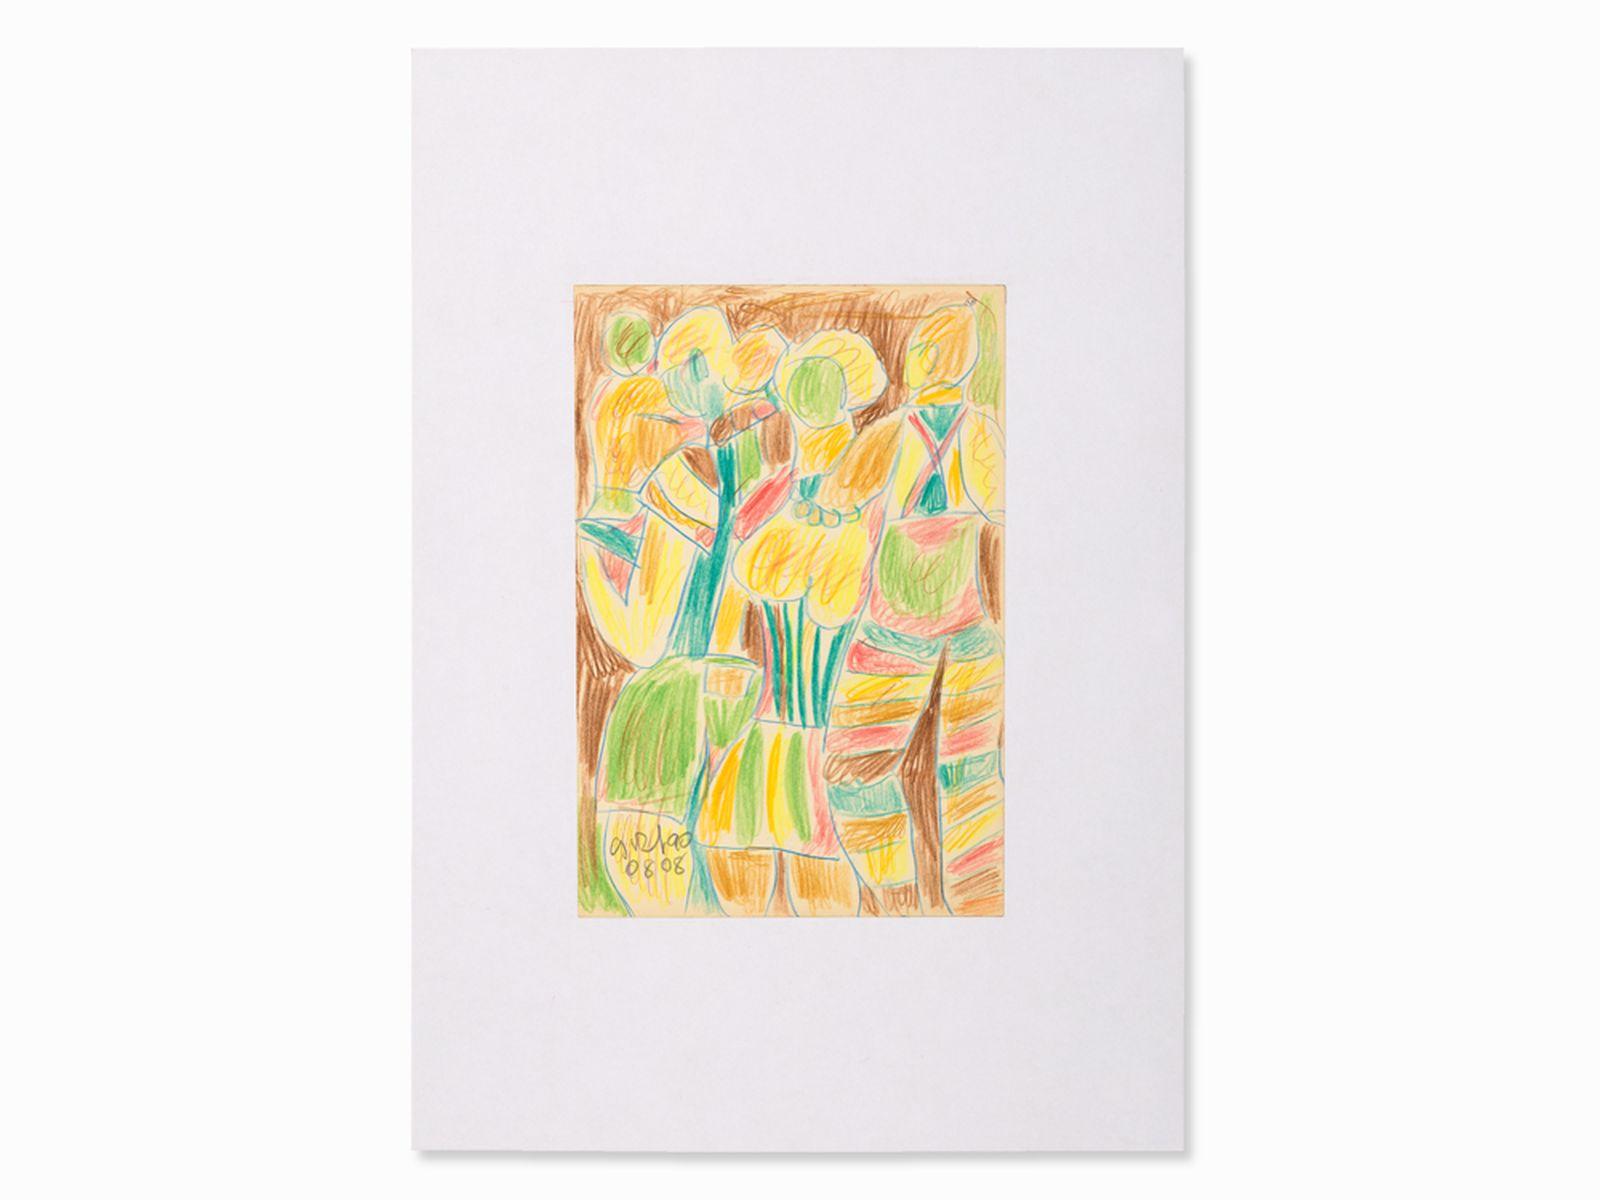 "#37 Miklos Németh, Drawing, Colorful Figures, Hungary, 2008 | Miklos Németh (1934-2012) ""Bunte Figuren"" Ungarn, 2008 Image"